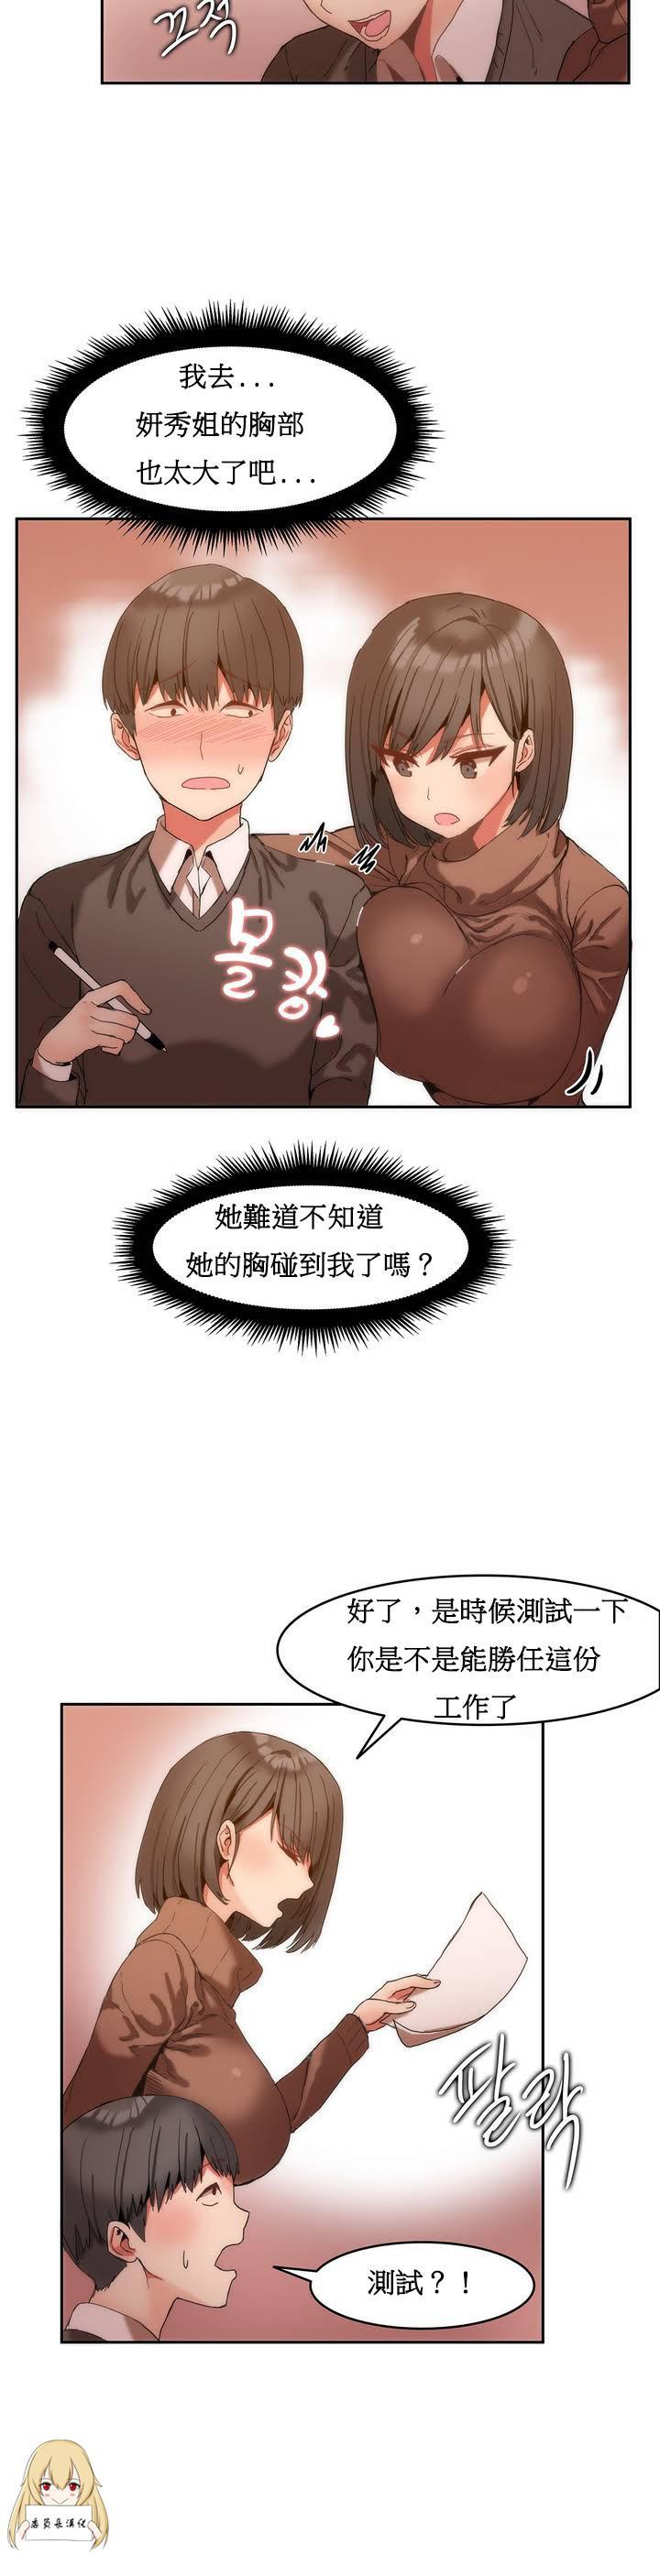 Hahri's Lumpy Boardhouse Ch. 1~4【委員長個人漢化】(持續更新) 20